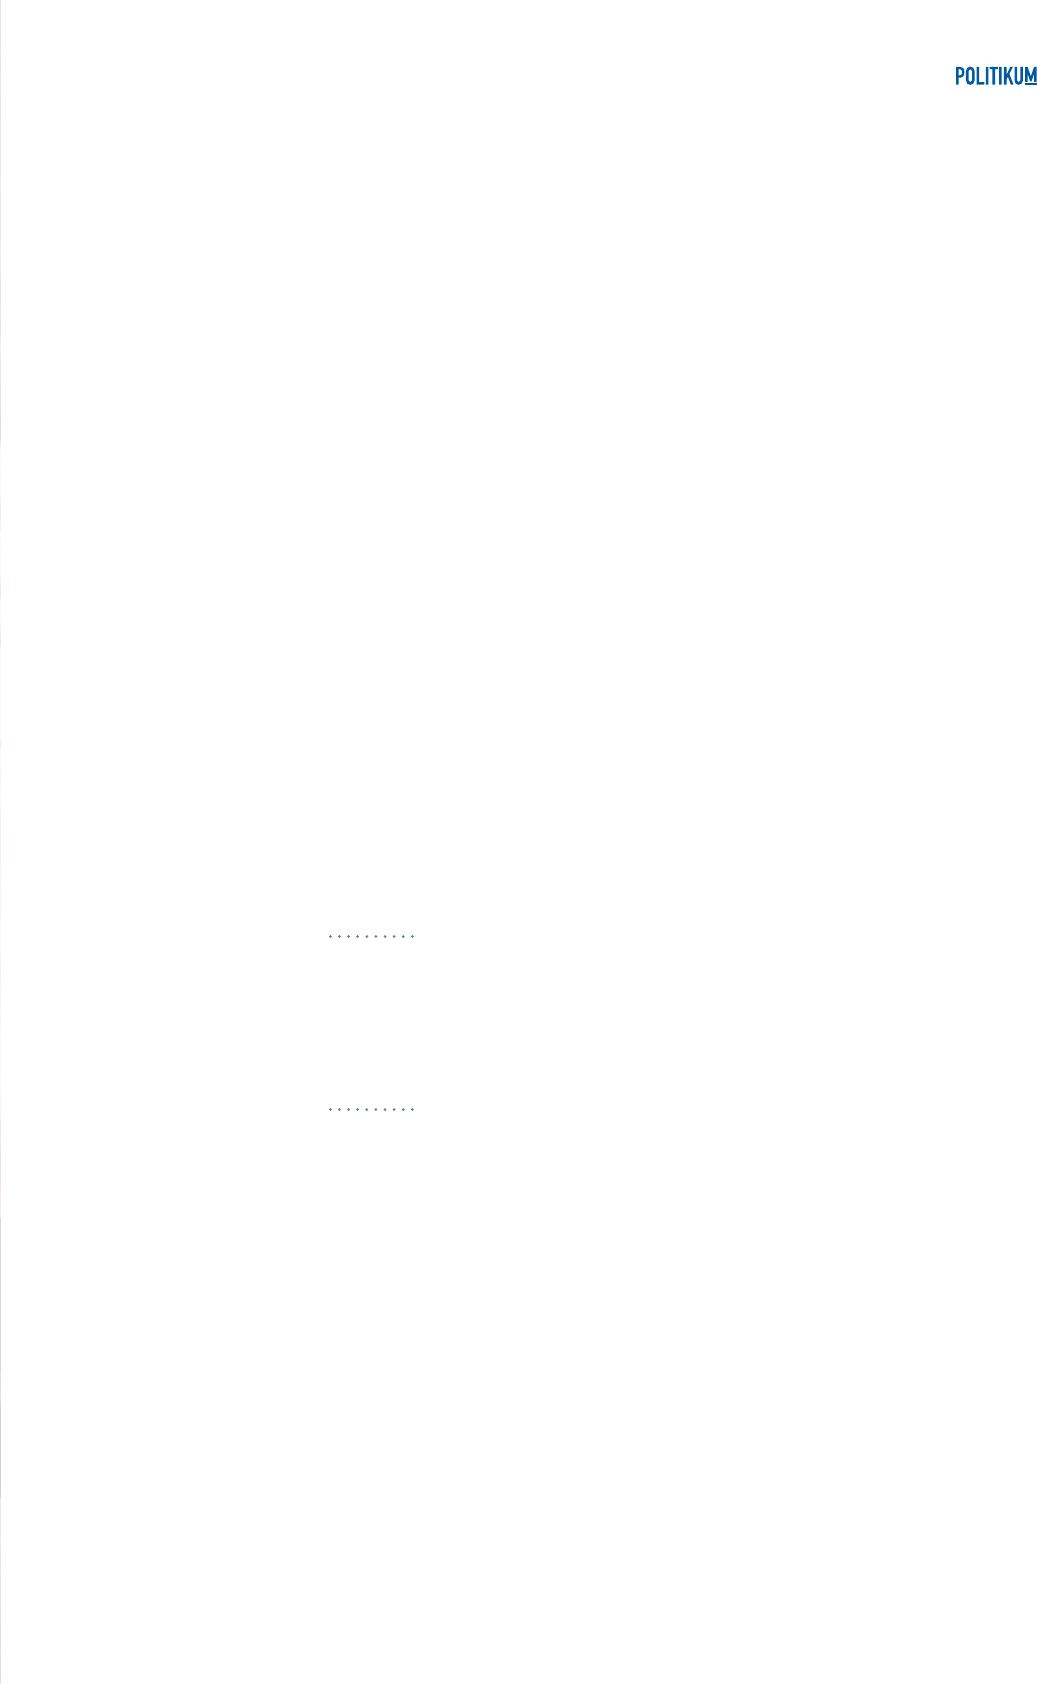 wansing-politikum.html.text.image5